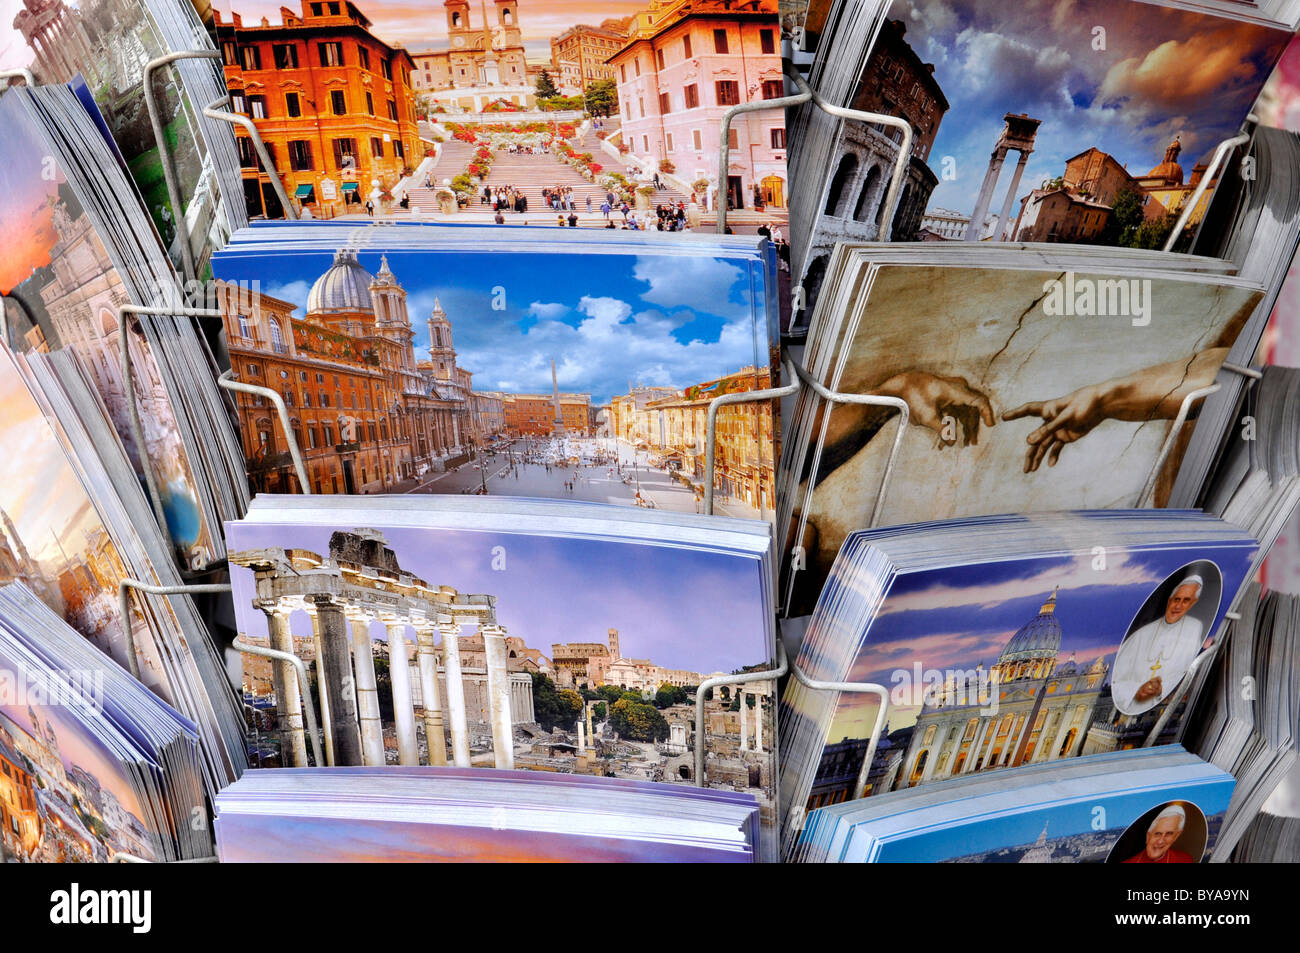 Postcards with Roman motifs, Rome, Lazio, Italy, Europe Stock Photo